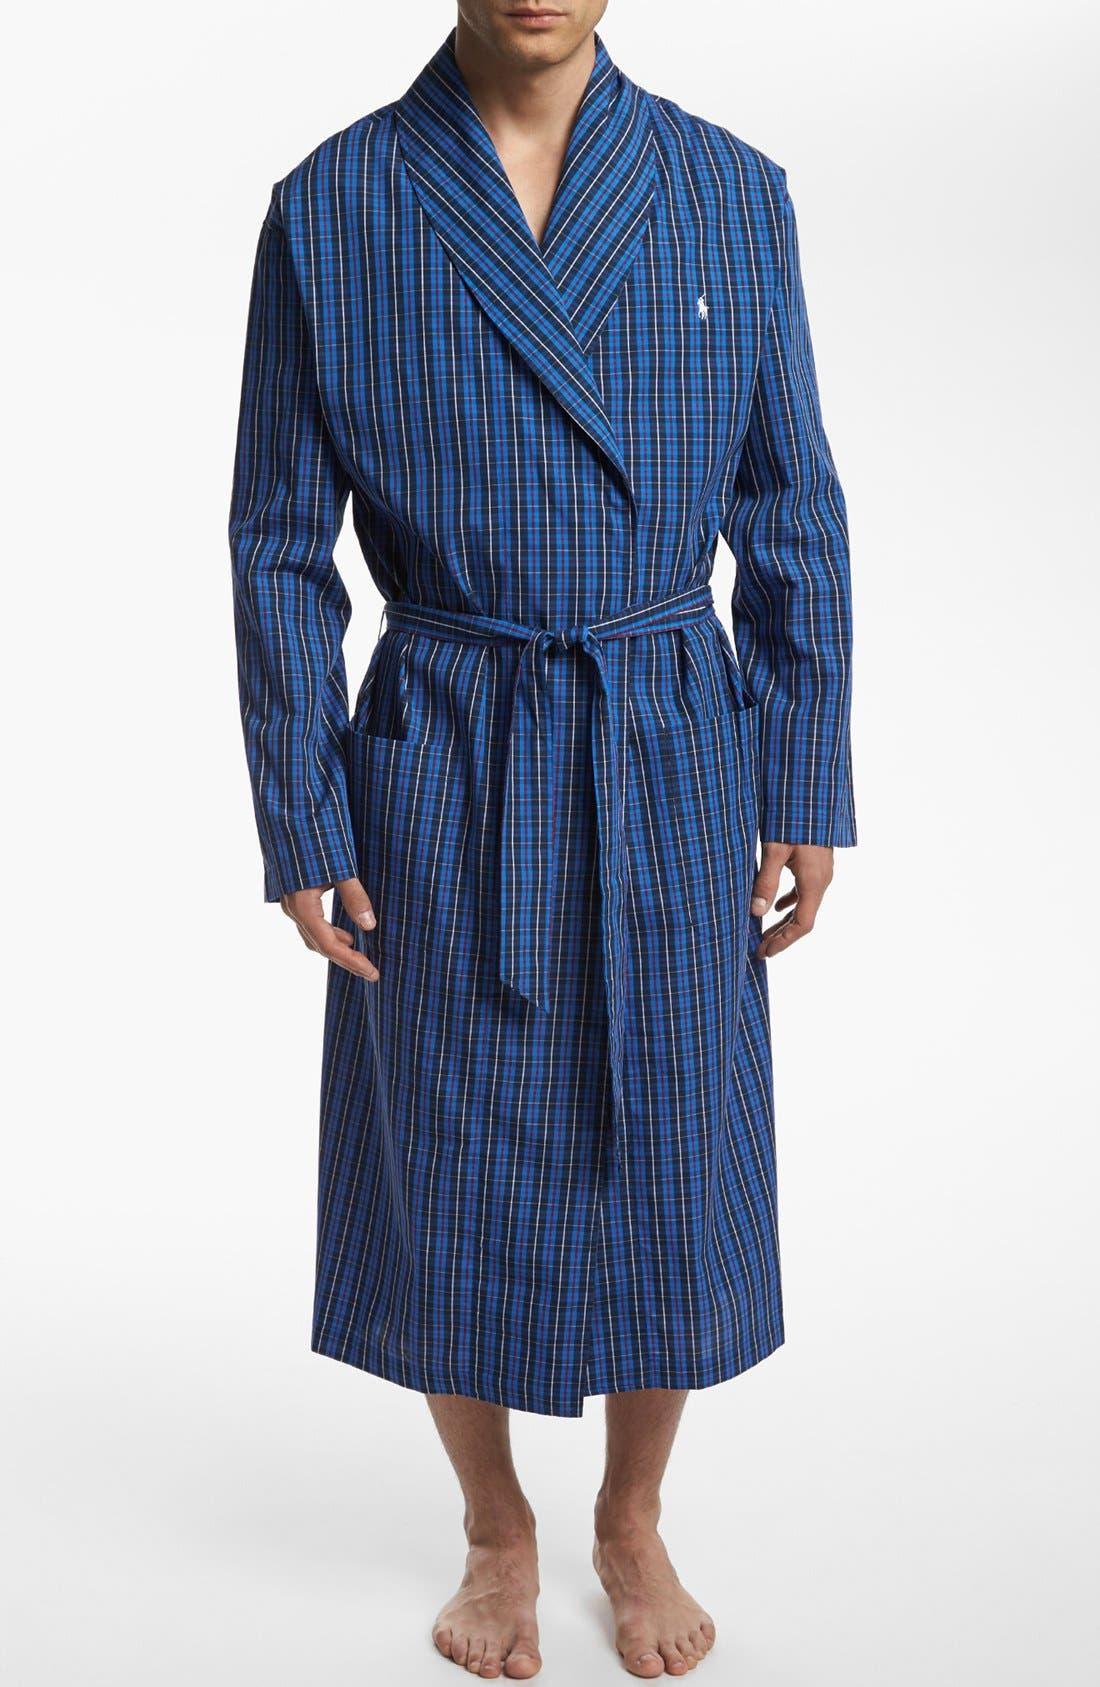 Alternate Image 1 Selected - Polo Ralph Lauren Woven Robe